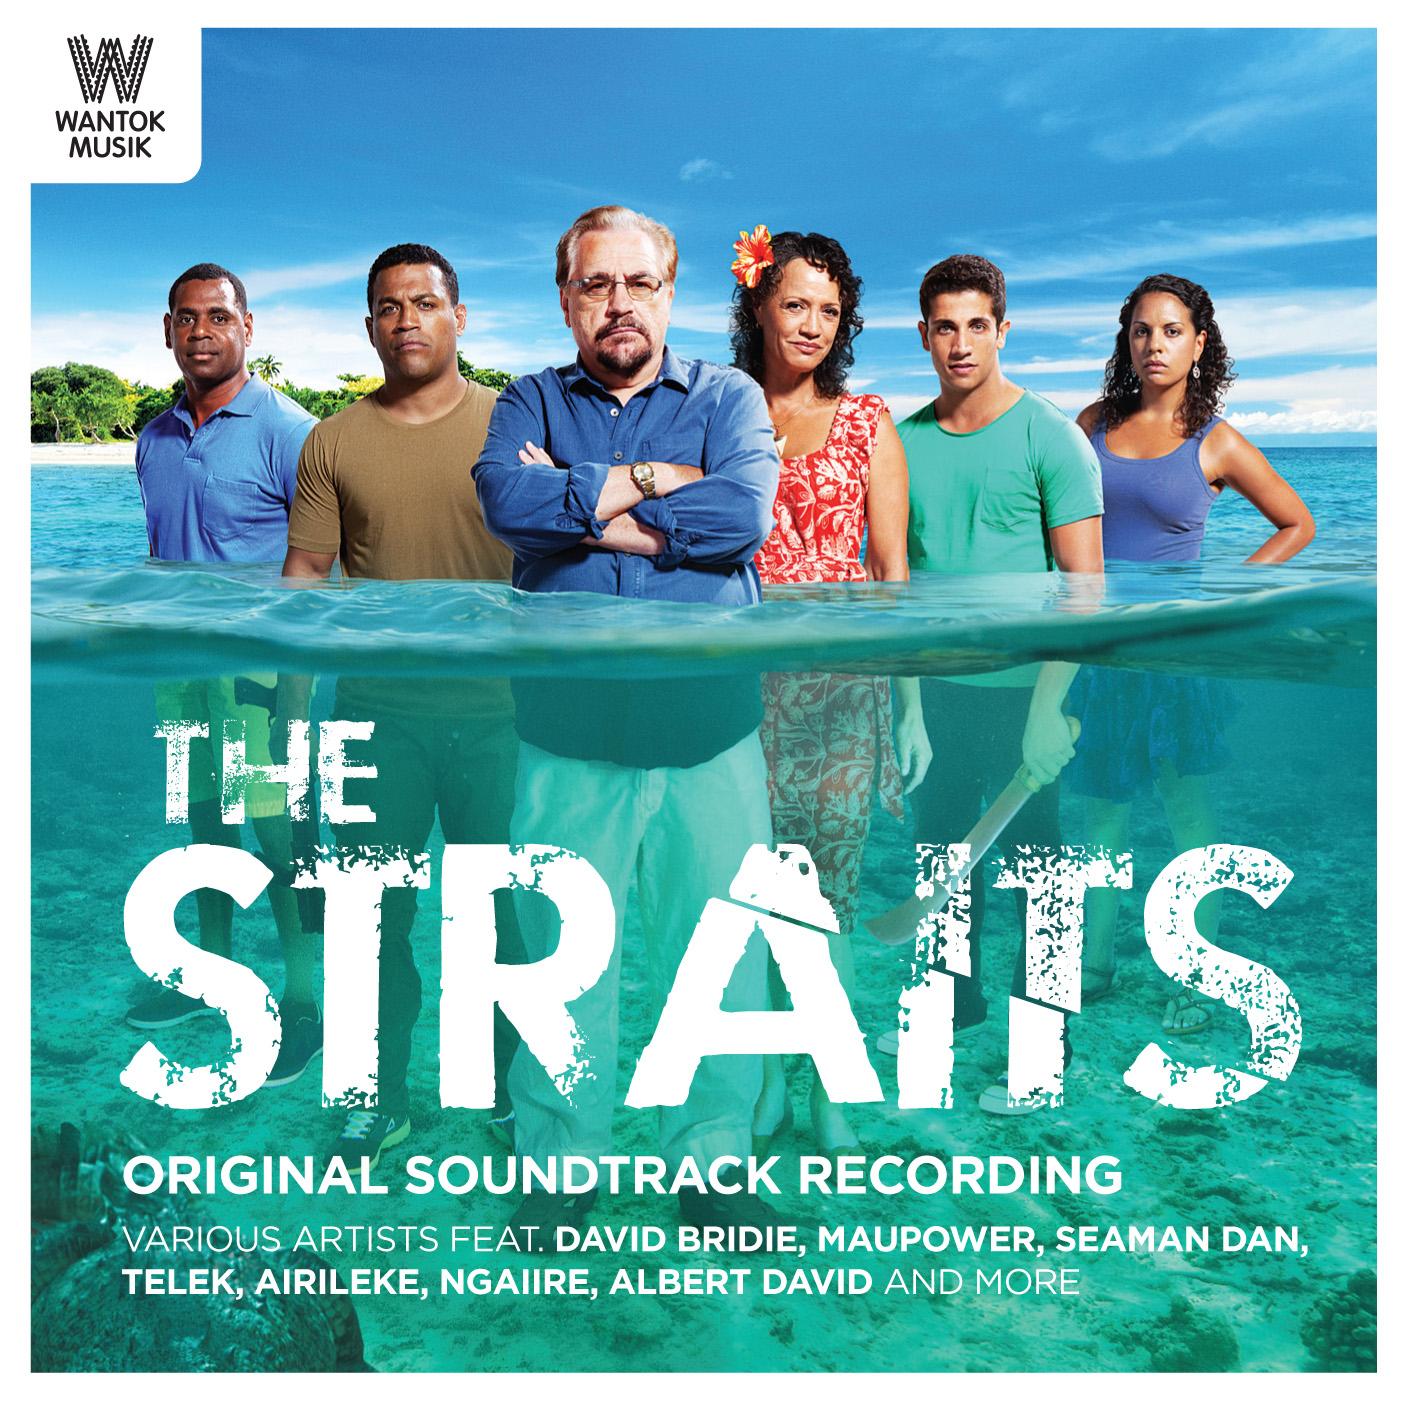 Various Artists - The Straits - TV Soundtrack Album